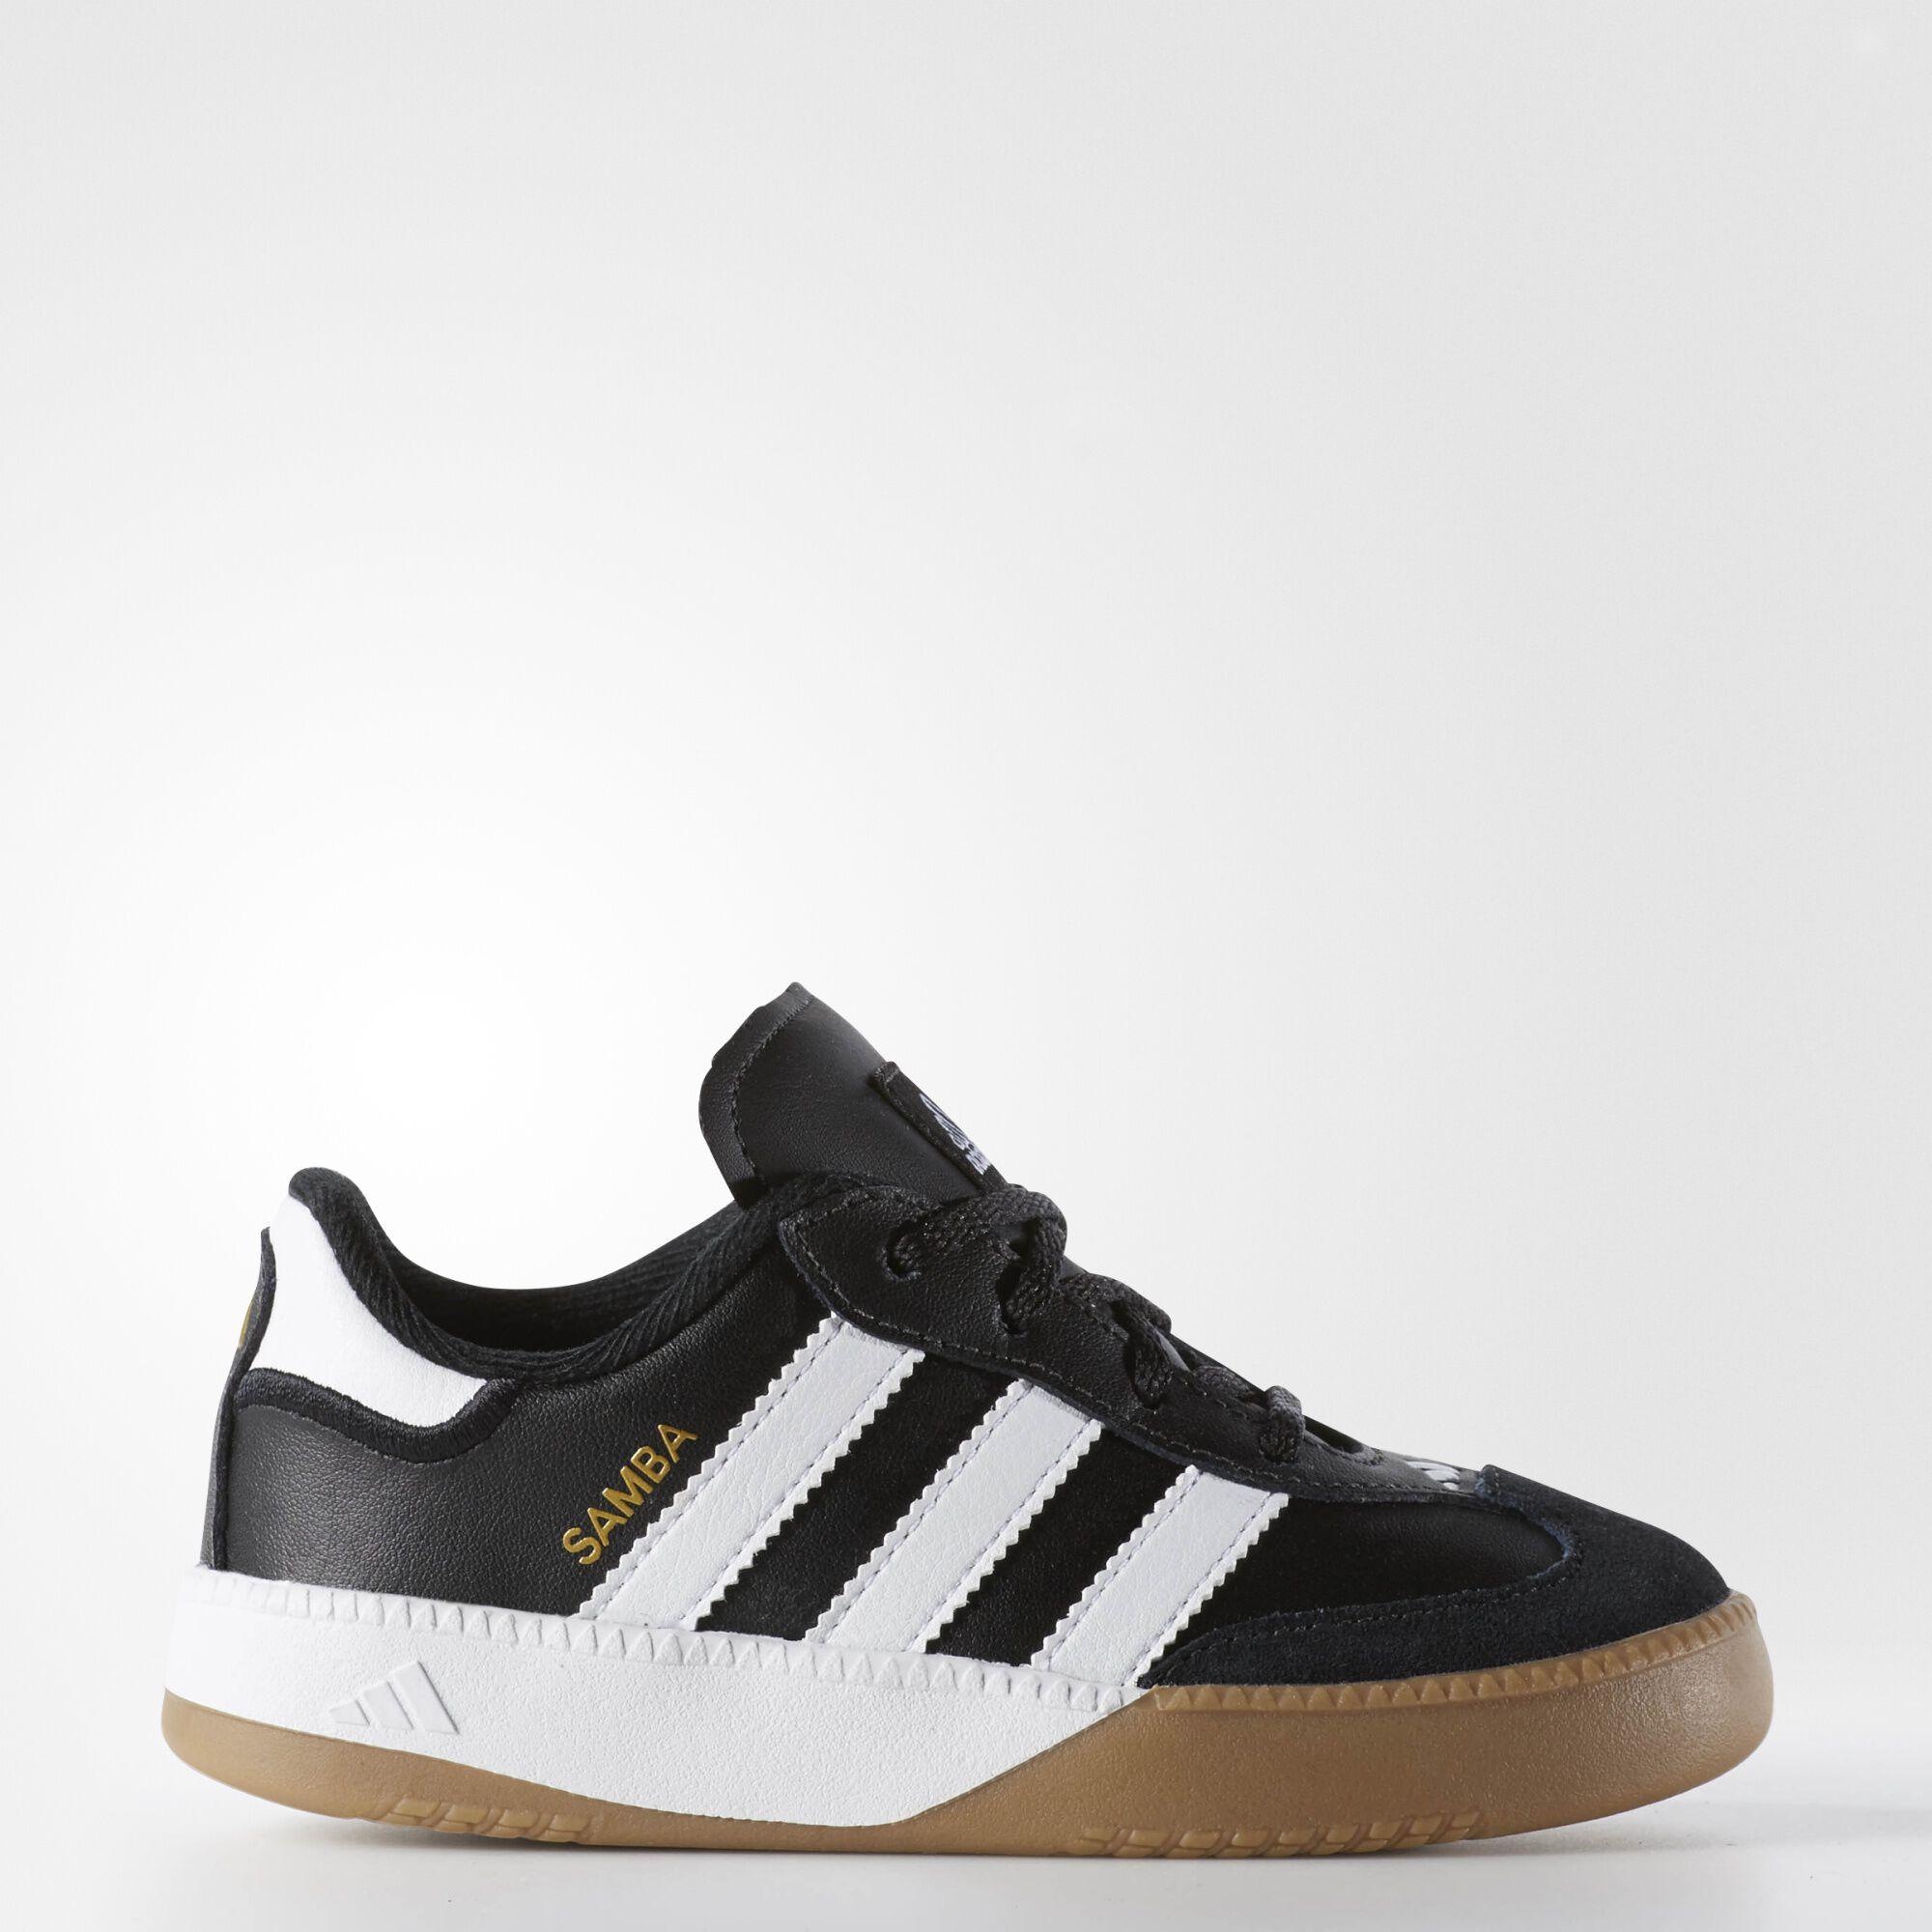 adidas samba baby shoes